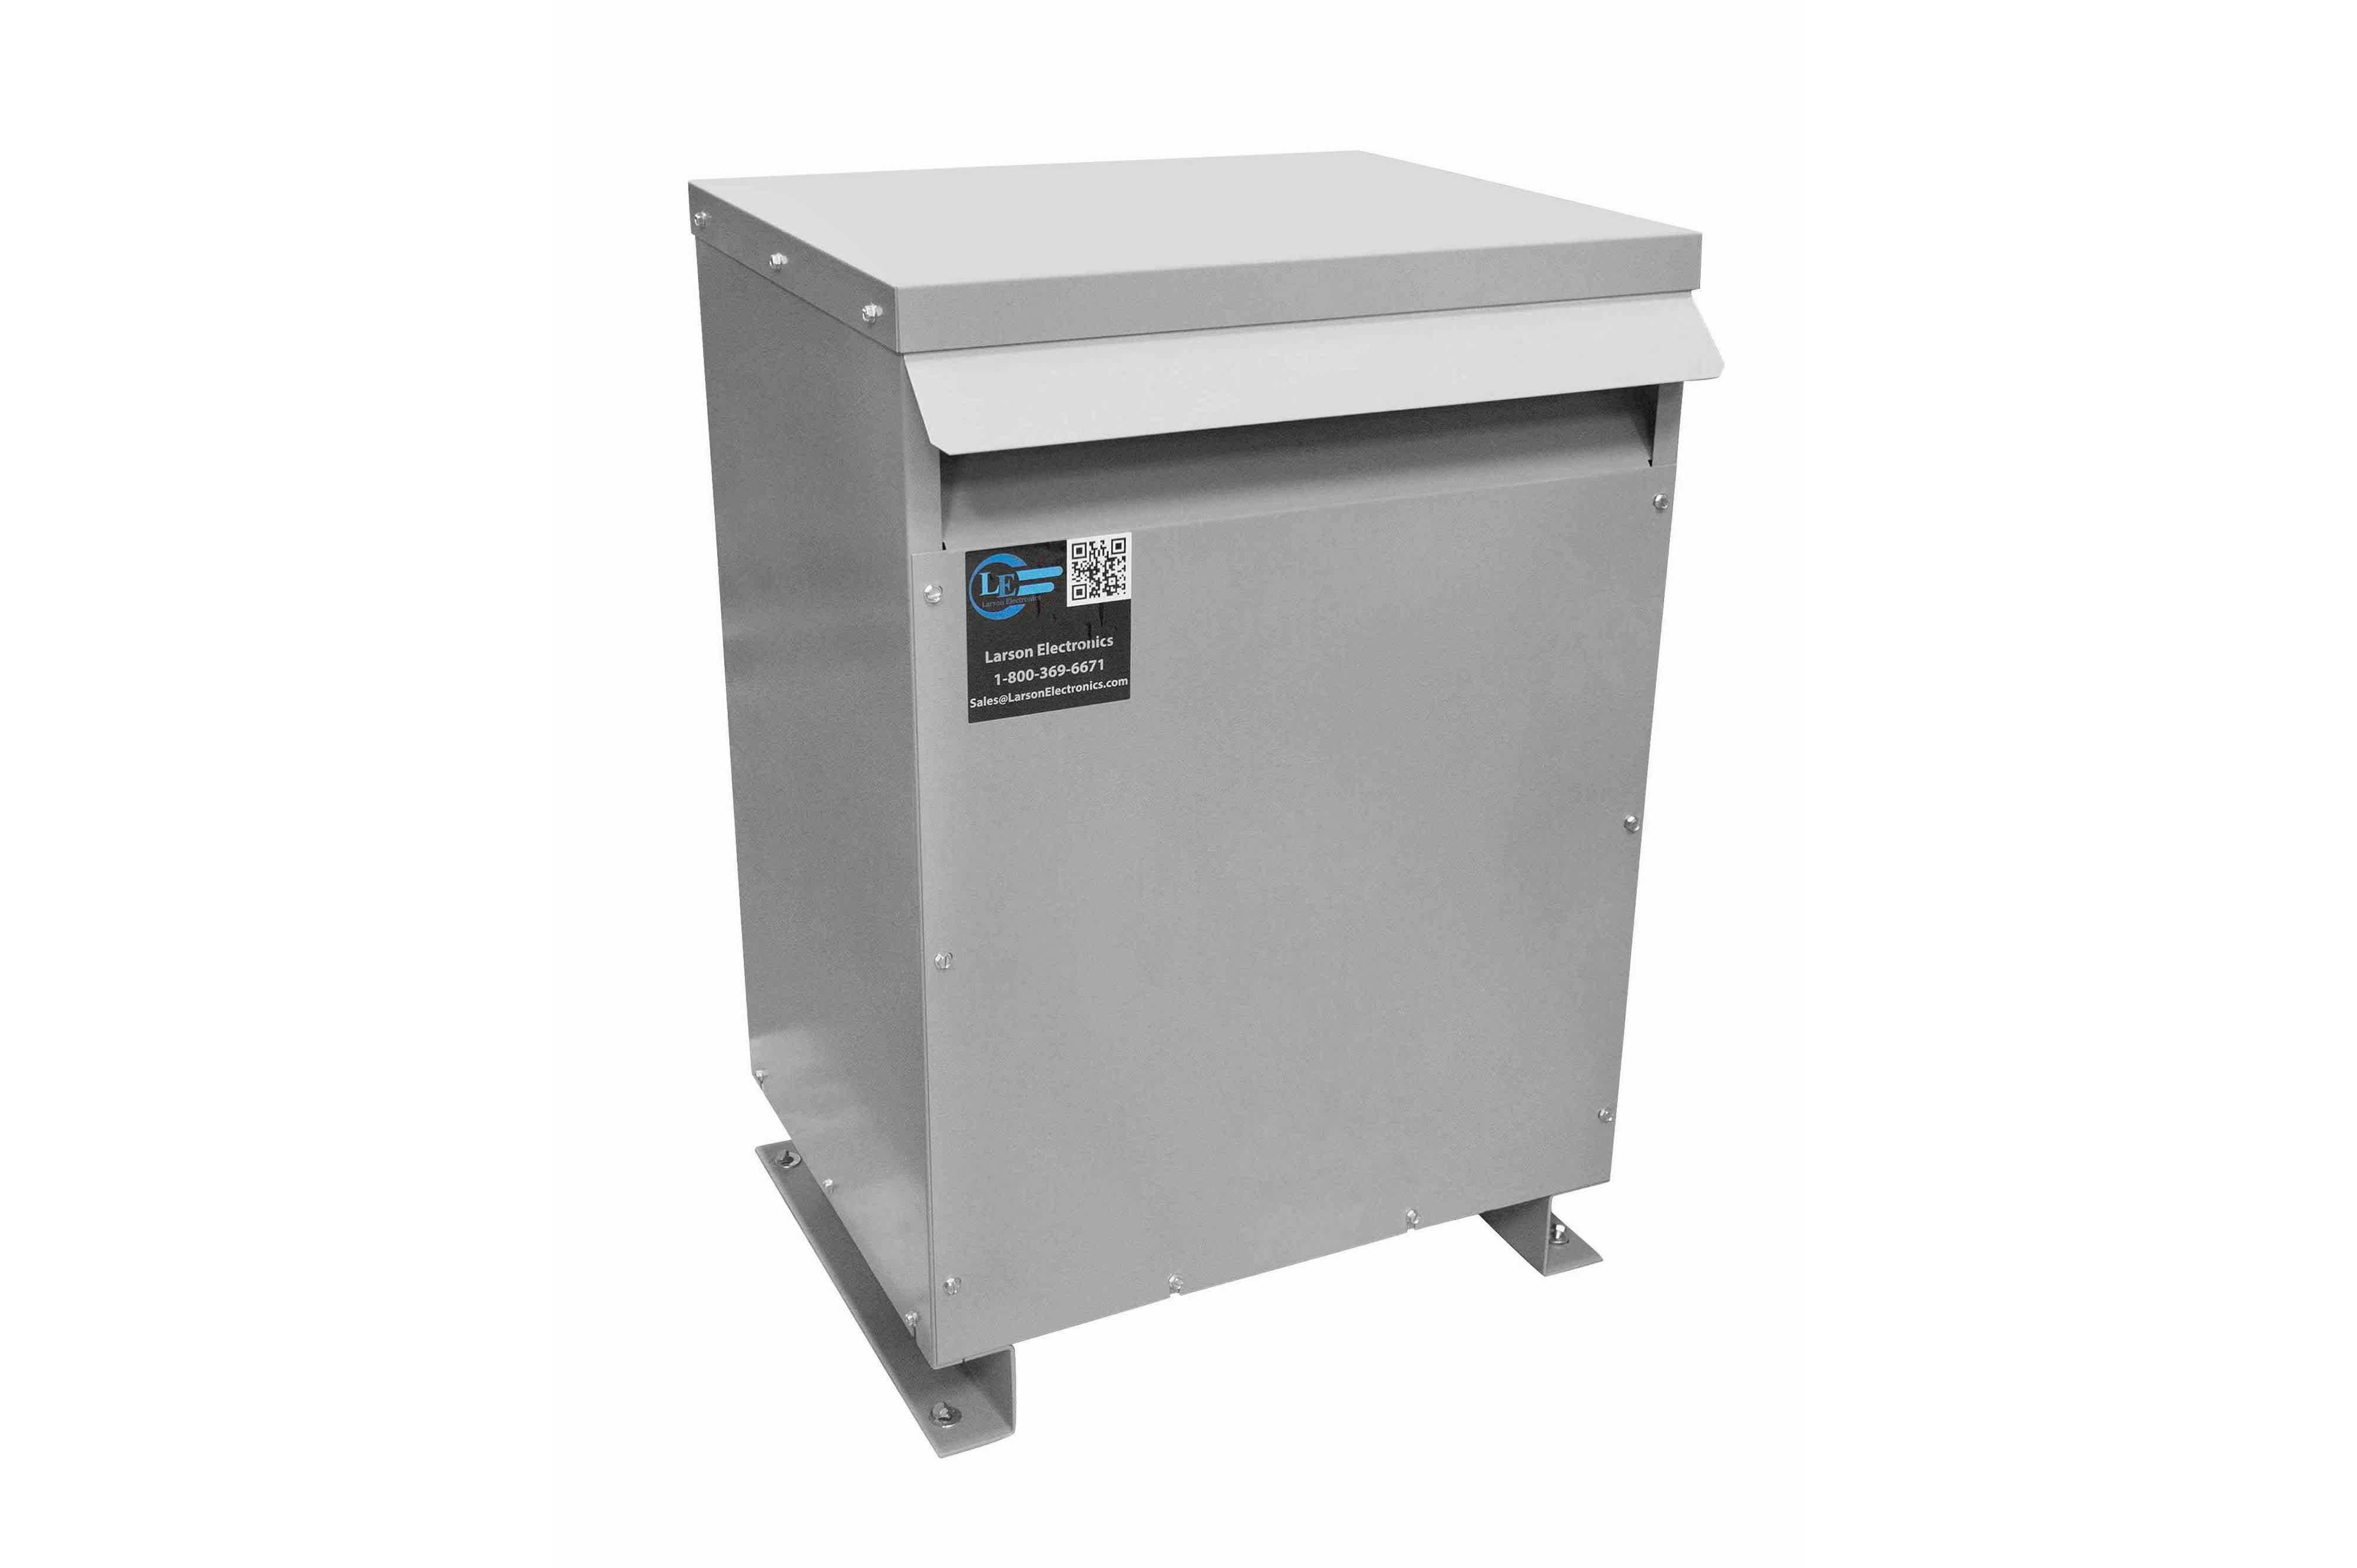 14 kVA 3PH Isolation Transformer, 240V Wye Primary, 600Y/347 Wye-N Secondary, N3R, Ventilated, 60 Hz